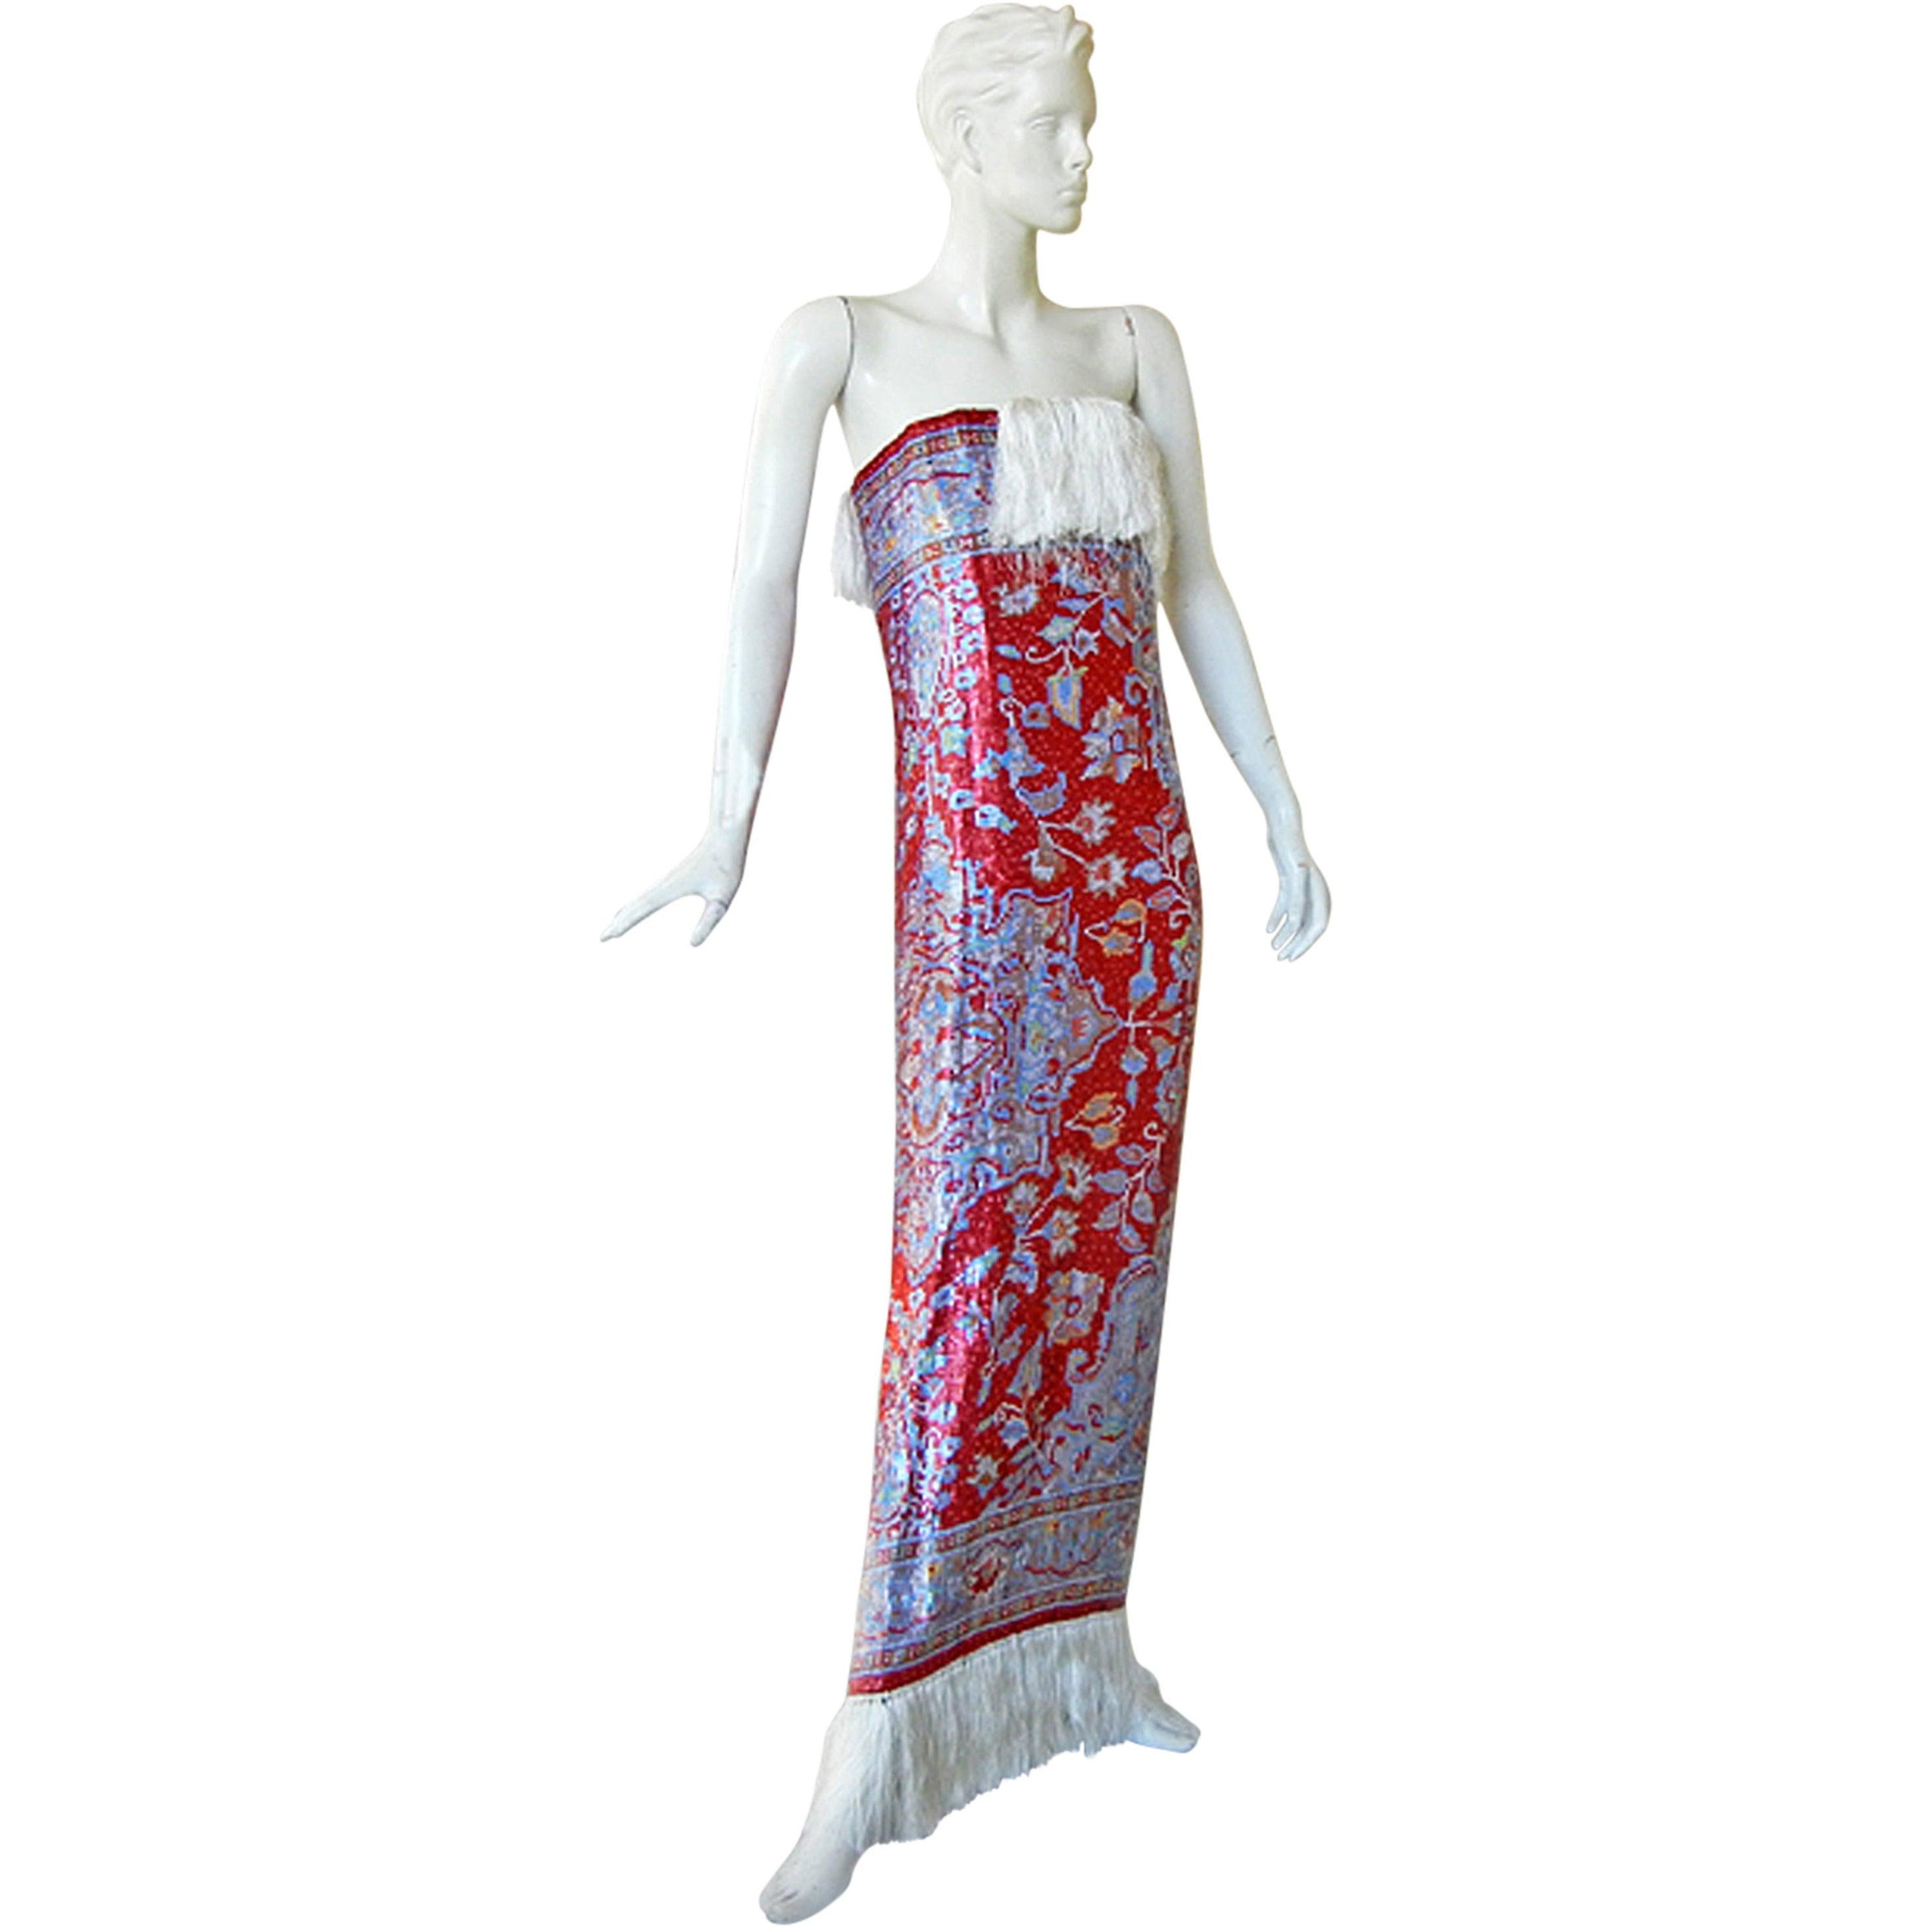 Maison Margiela Rare Beaded Tapestry Runway Dress Gown   New